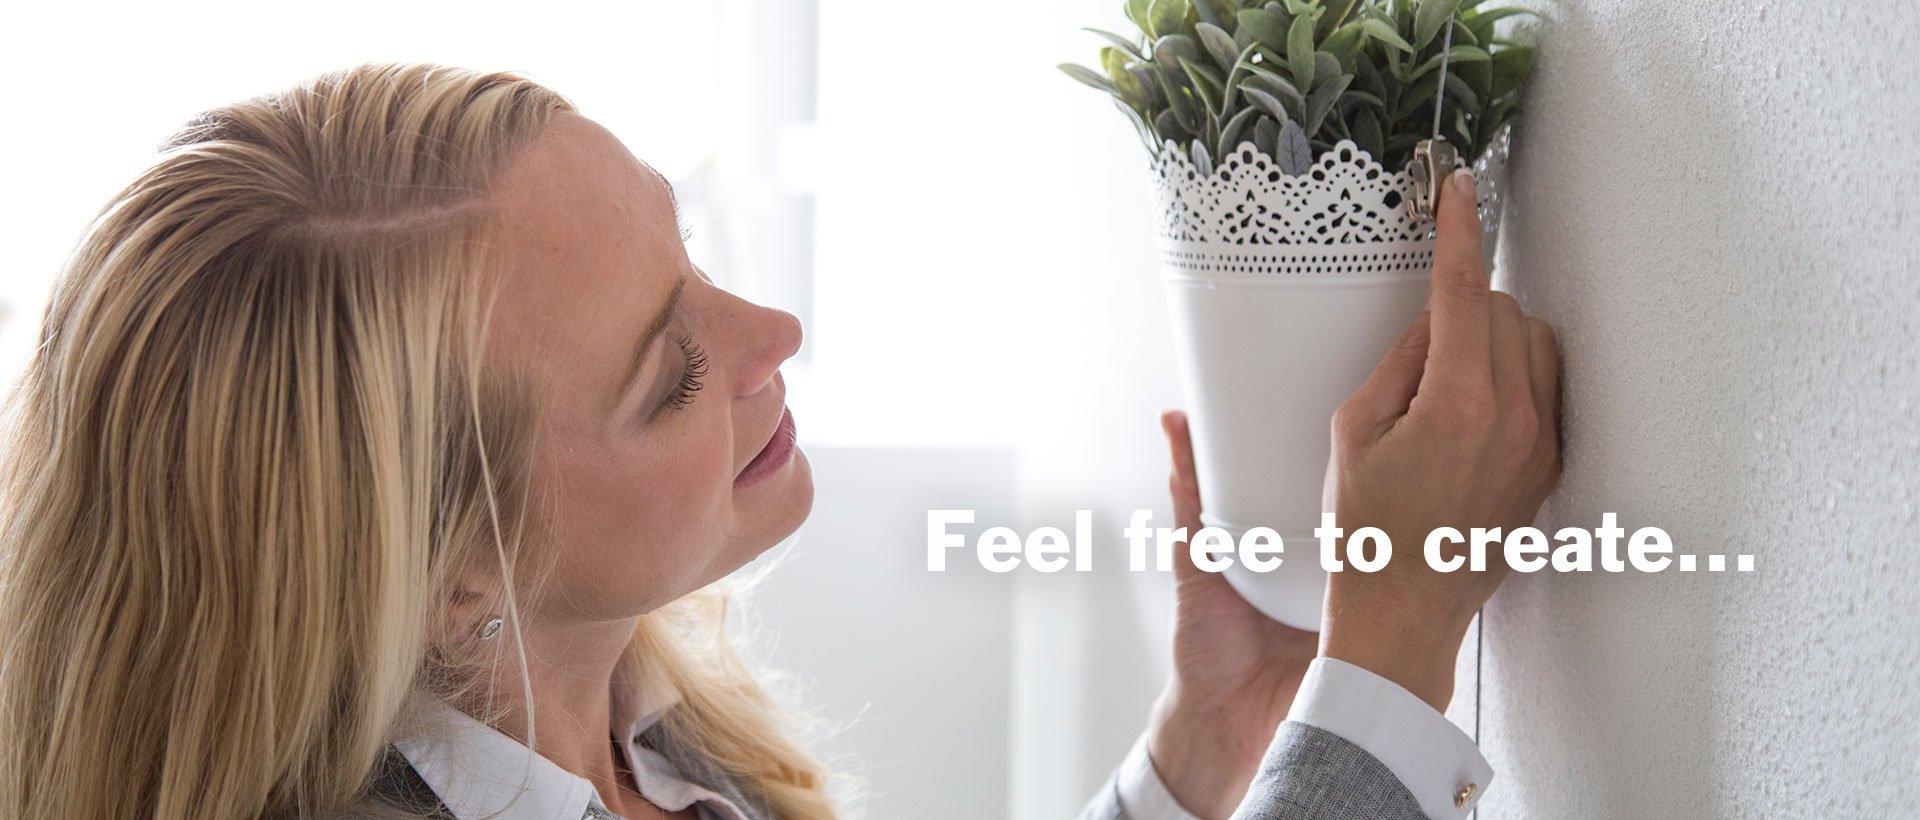 Pendure uma planta